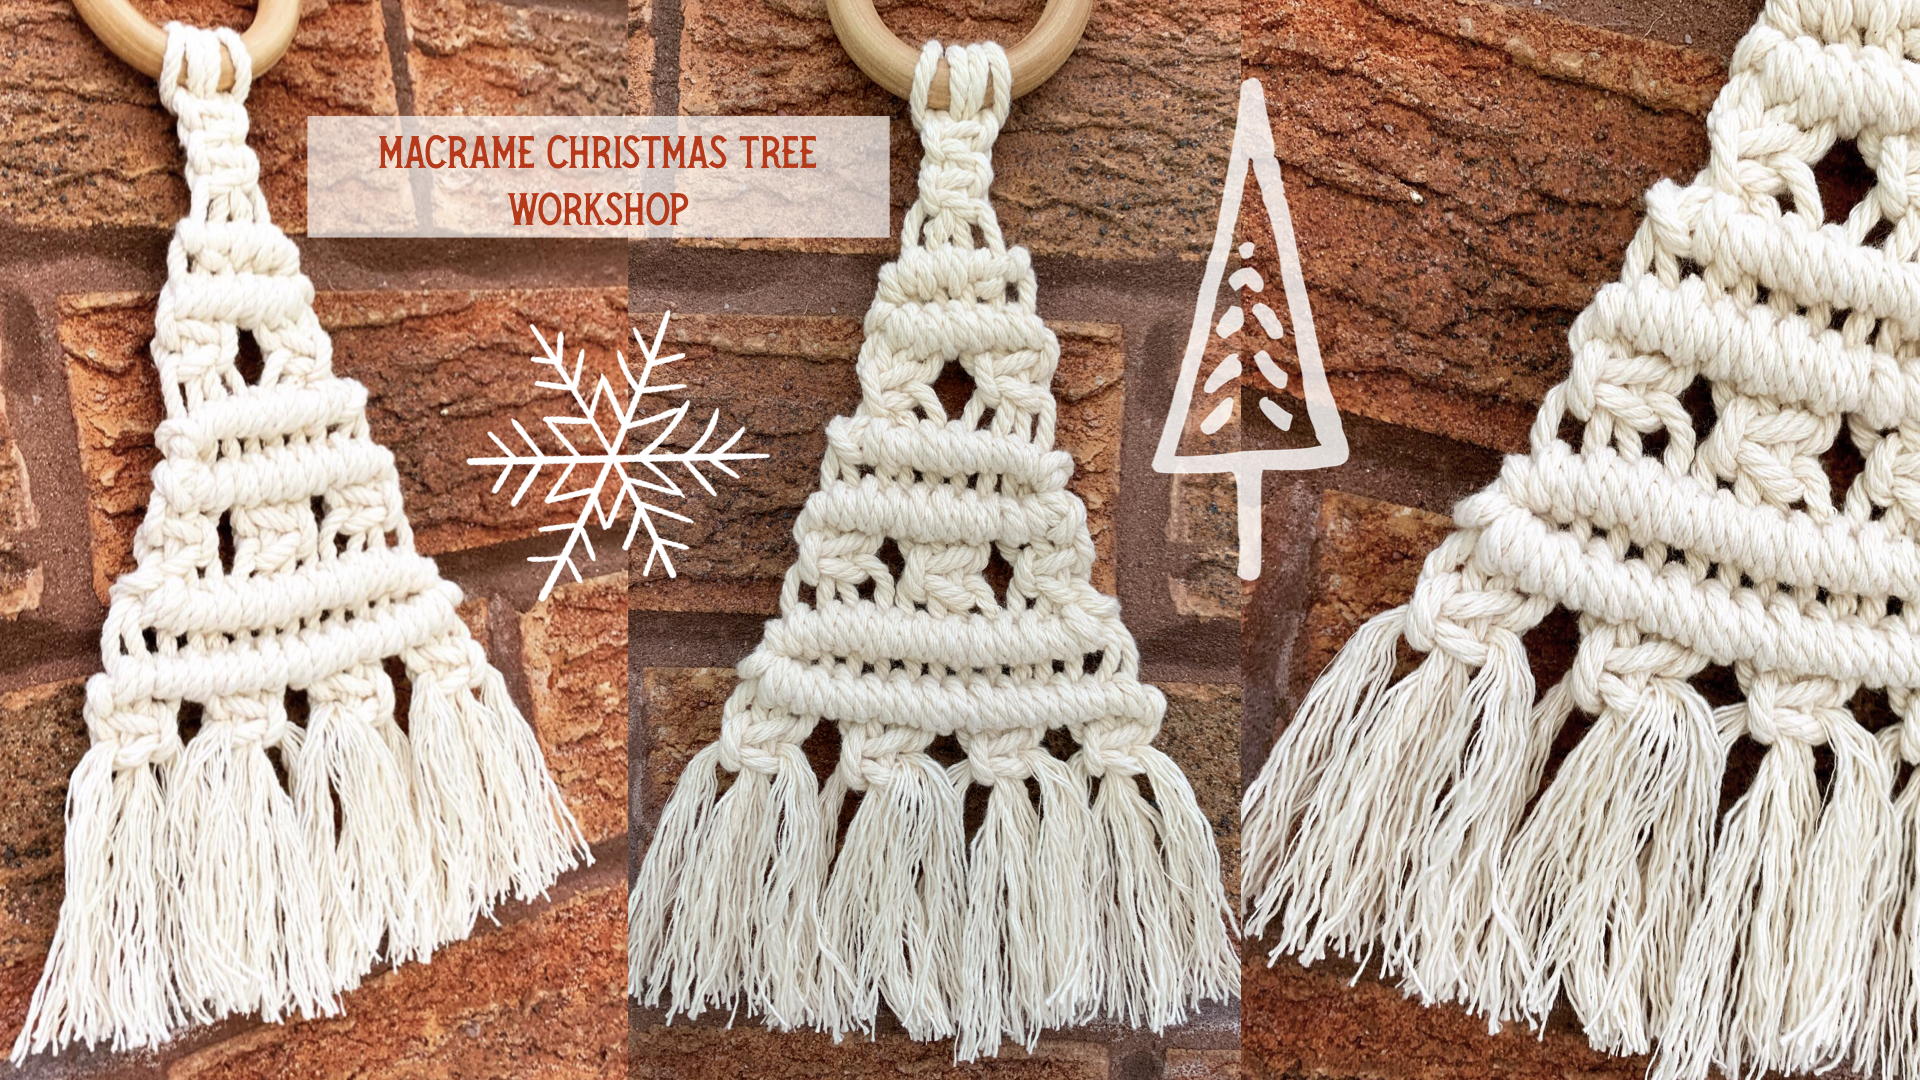 Coffee Christmas Tree.Macrame Christmas Tree Workshop At Changes Coffee